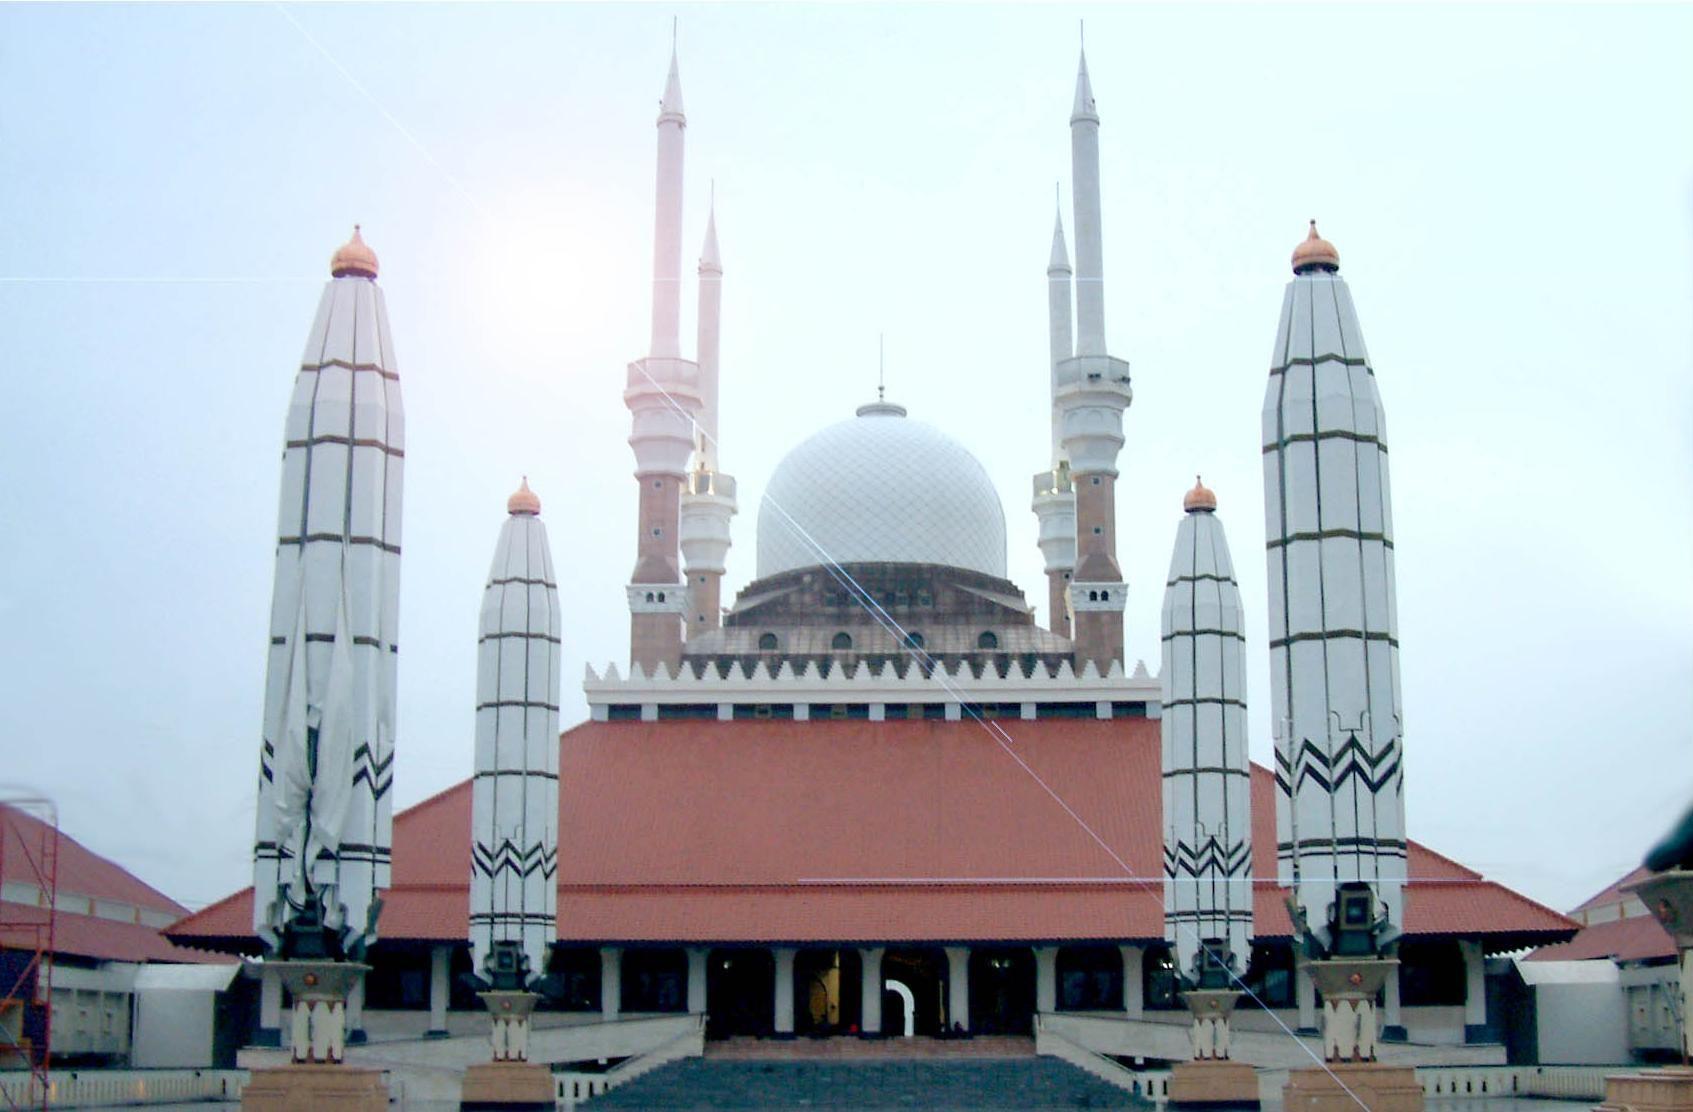 Citaten Tijd Jateng : Masjid agung jateng skorne haqqislam saracen mideast scenery ideas